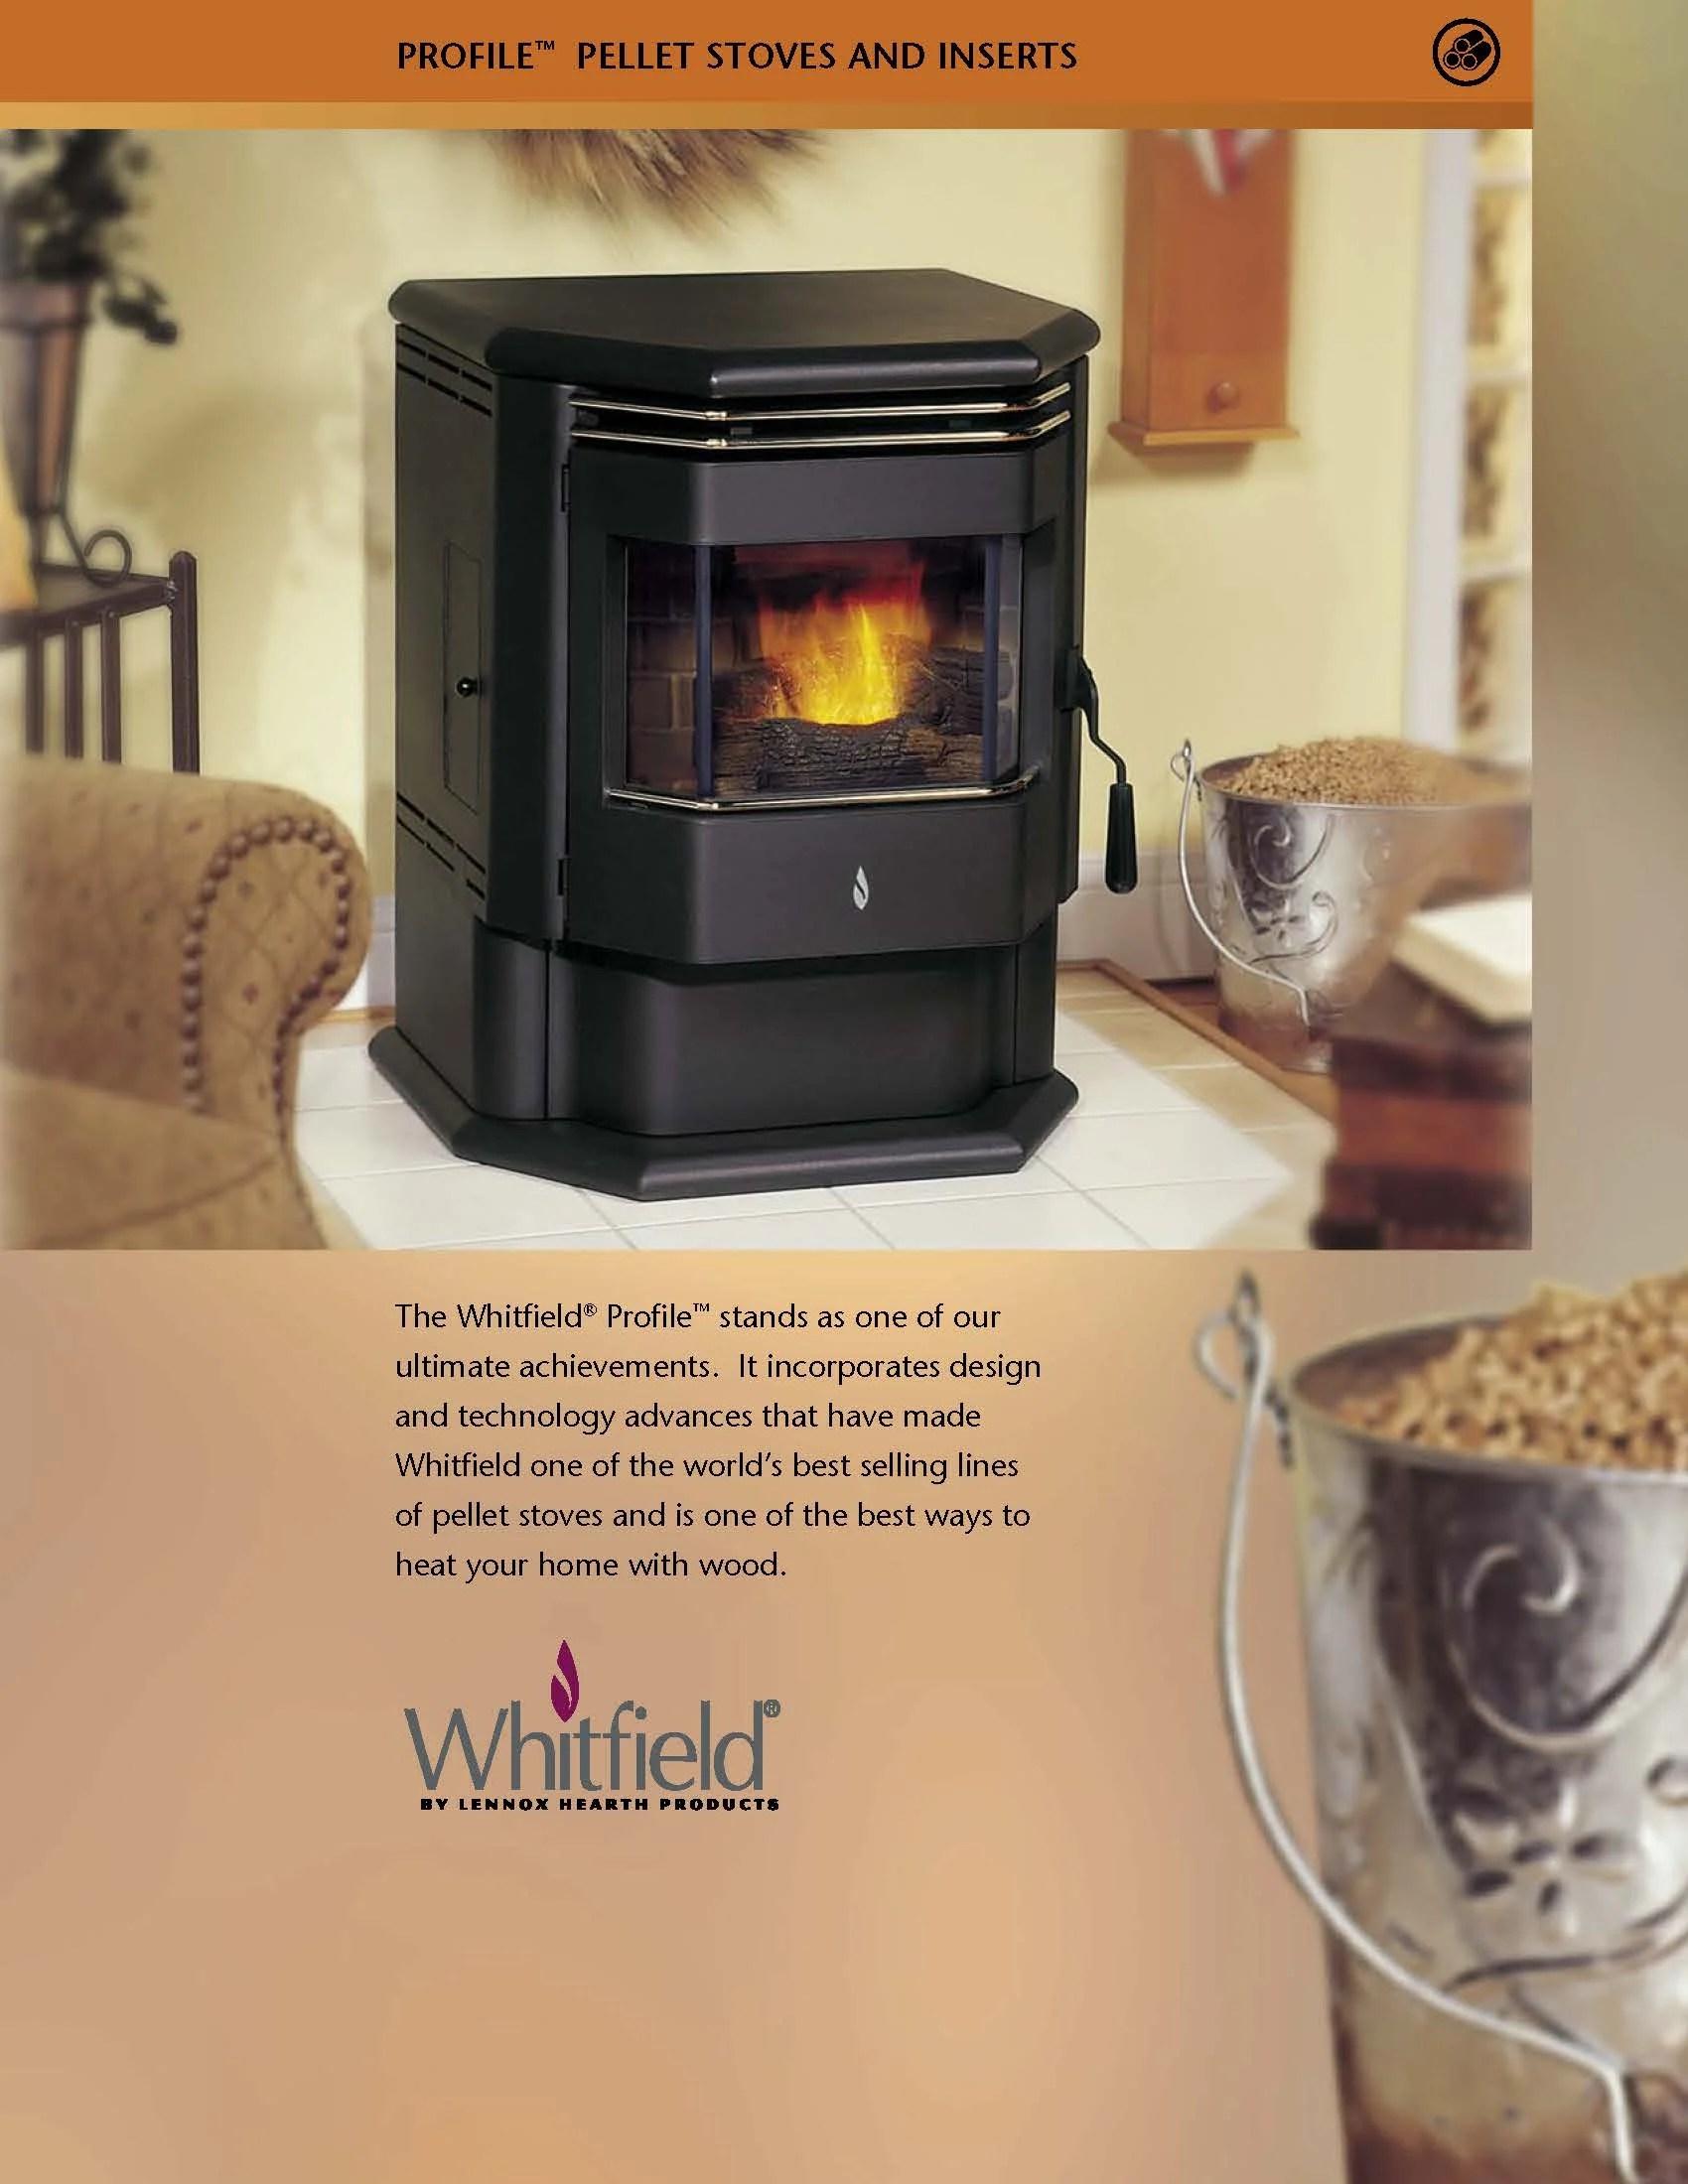 Whitfield Profile 20 30 Pellet Stove Brochure